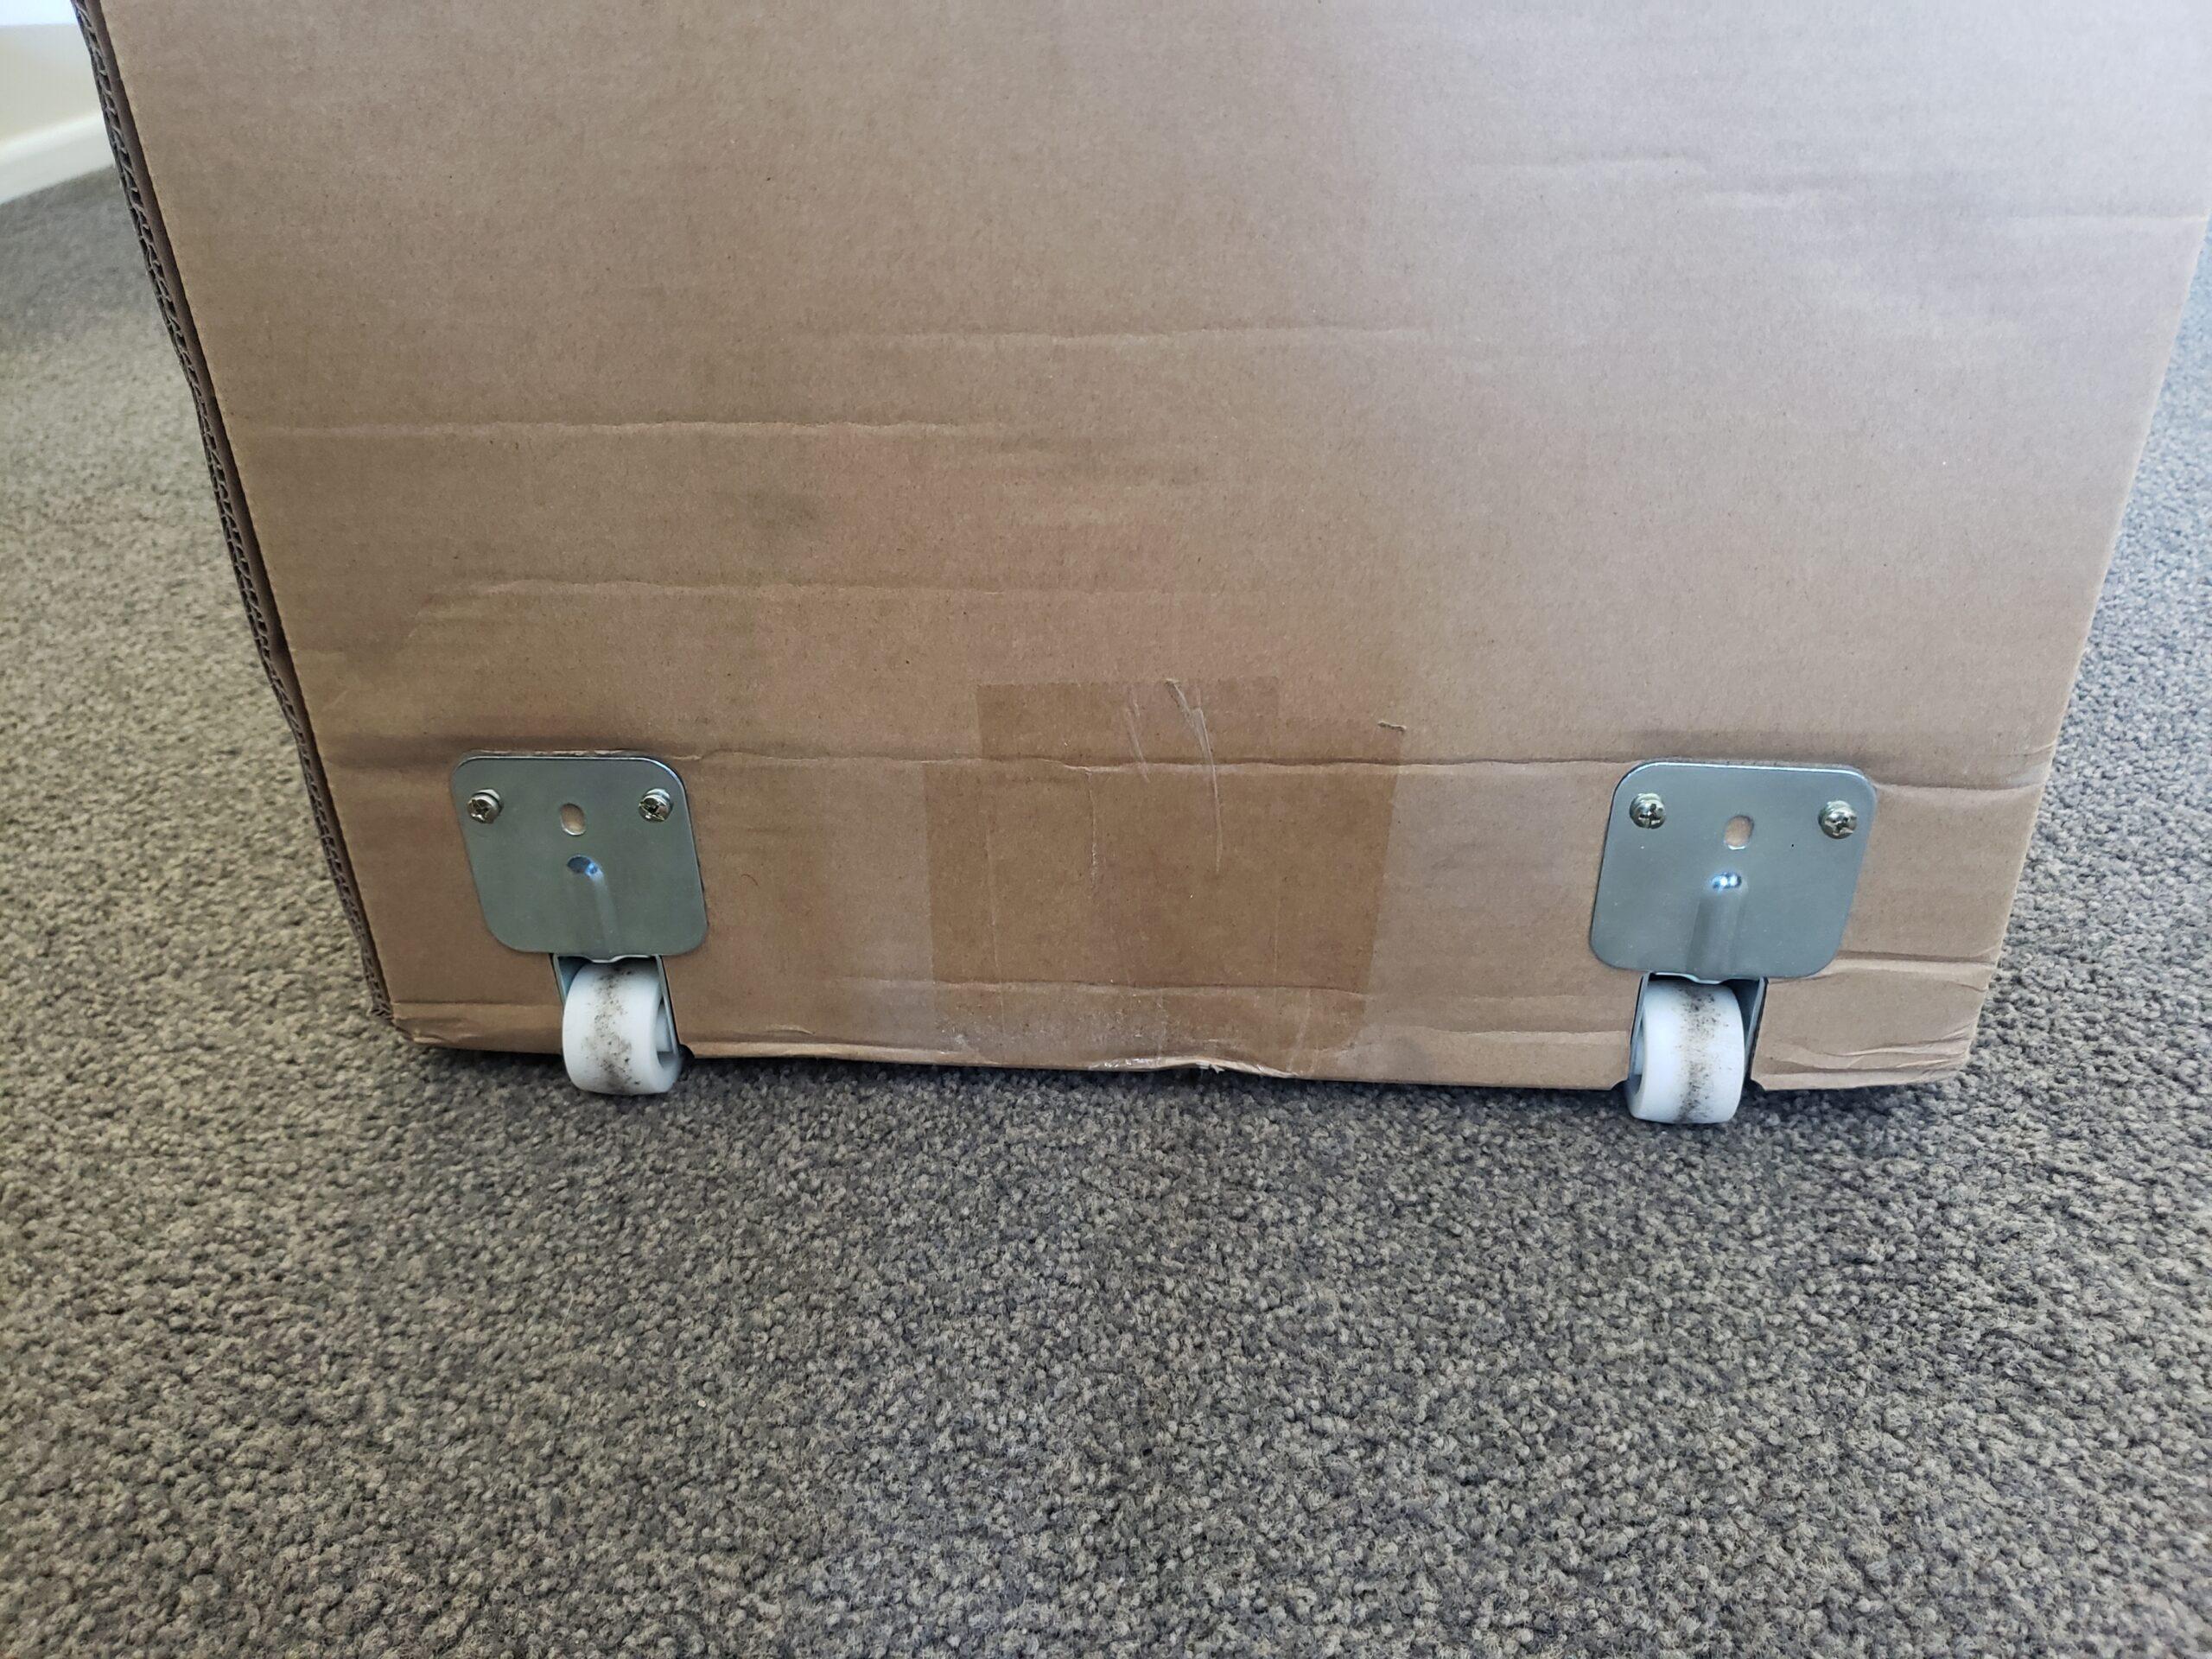 The Peacelily Mattress Box Has Wheels